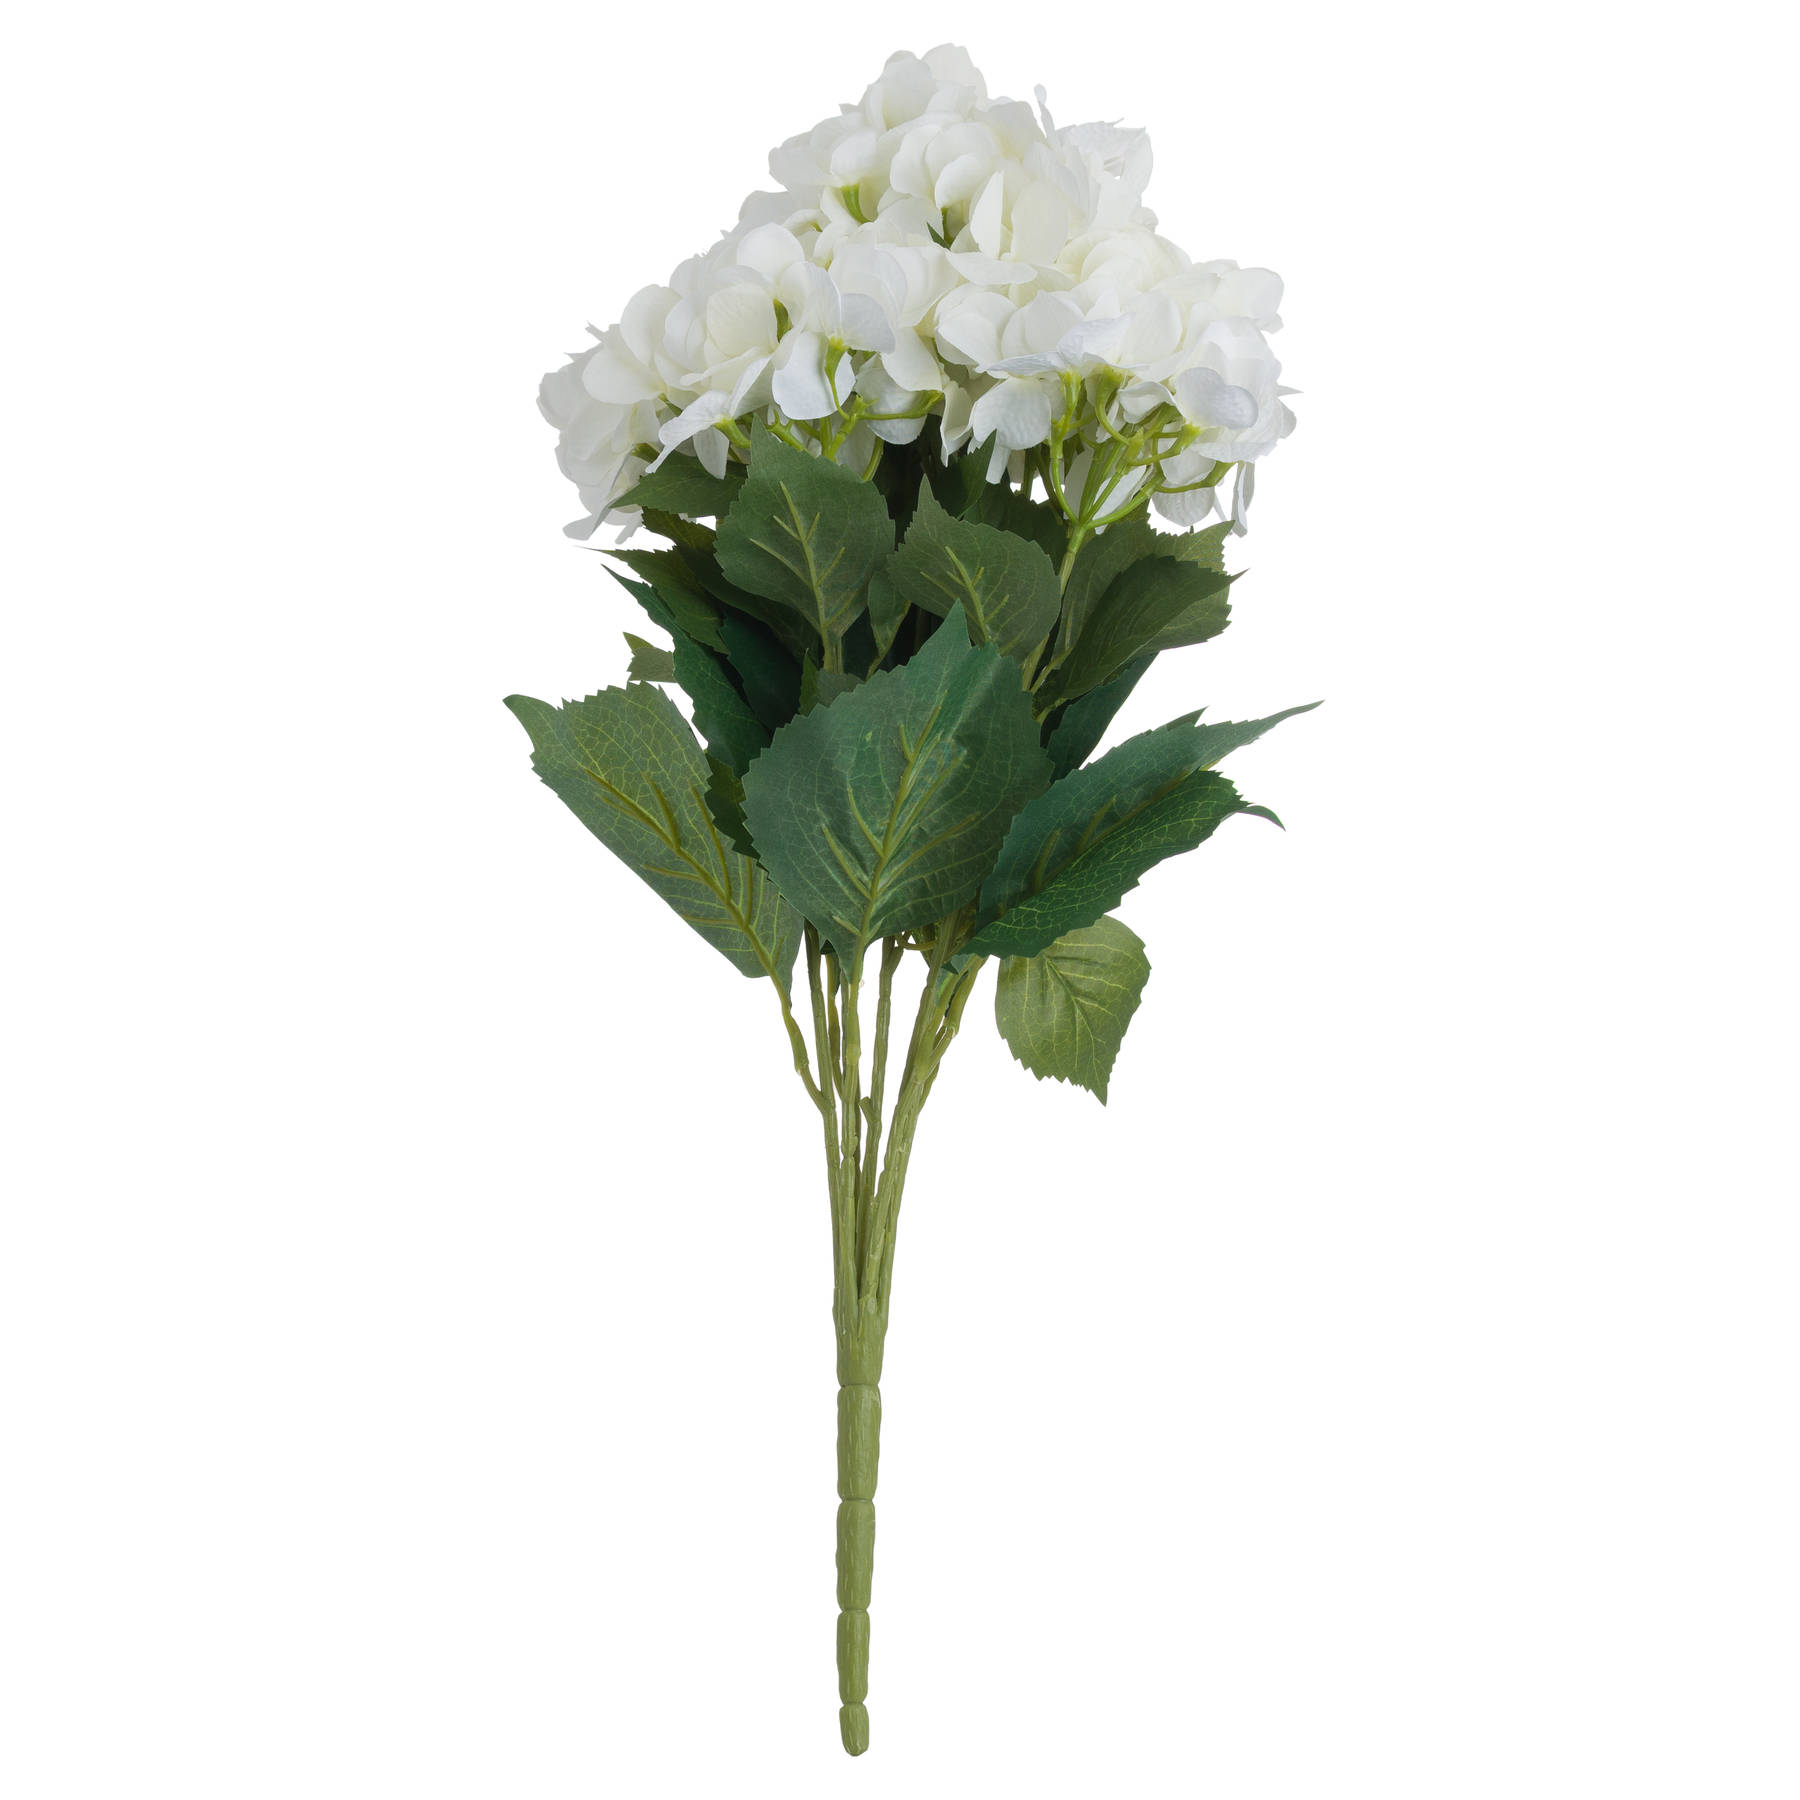 White Hydrangea Bouquet - Image 6